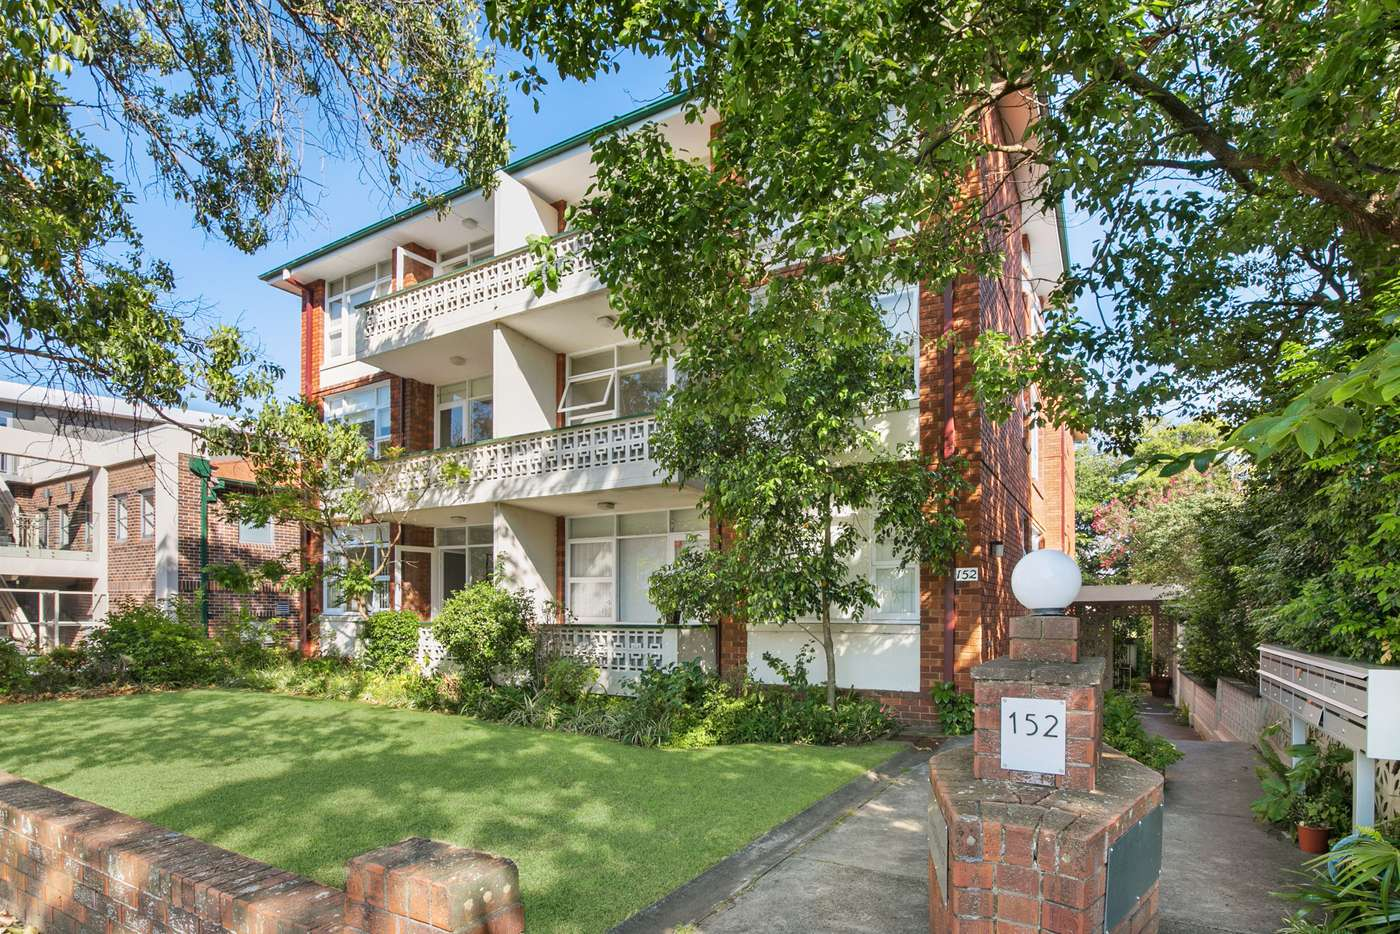 Main view of Homely apartment listing, 1/152 Raglan Street, Mosman NSW 2088